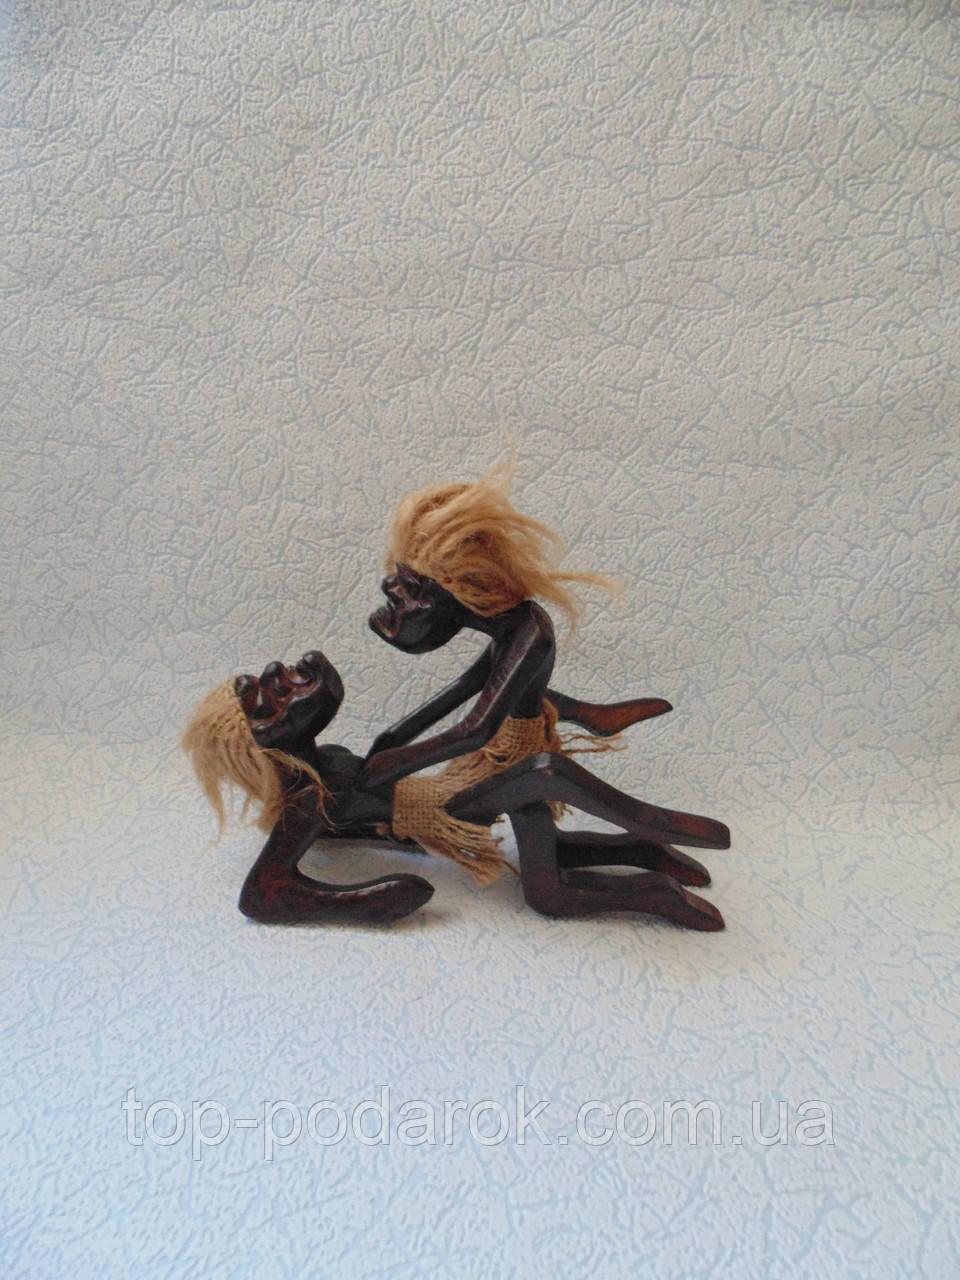 Статуэтка деревянная Камасутра